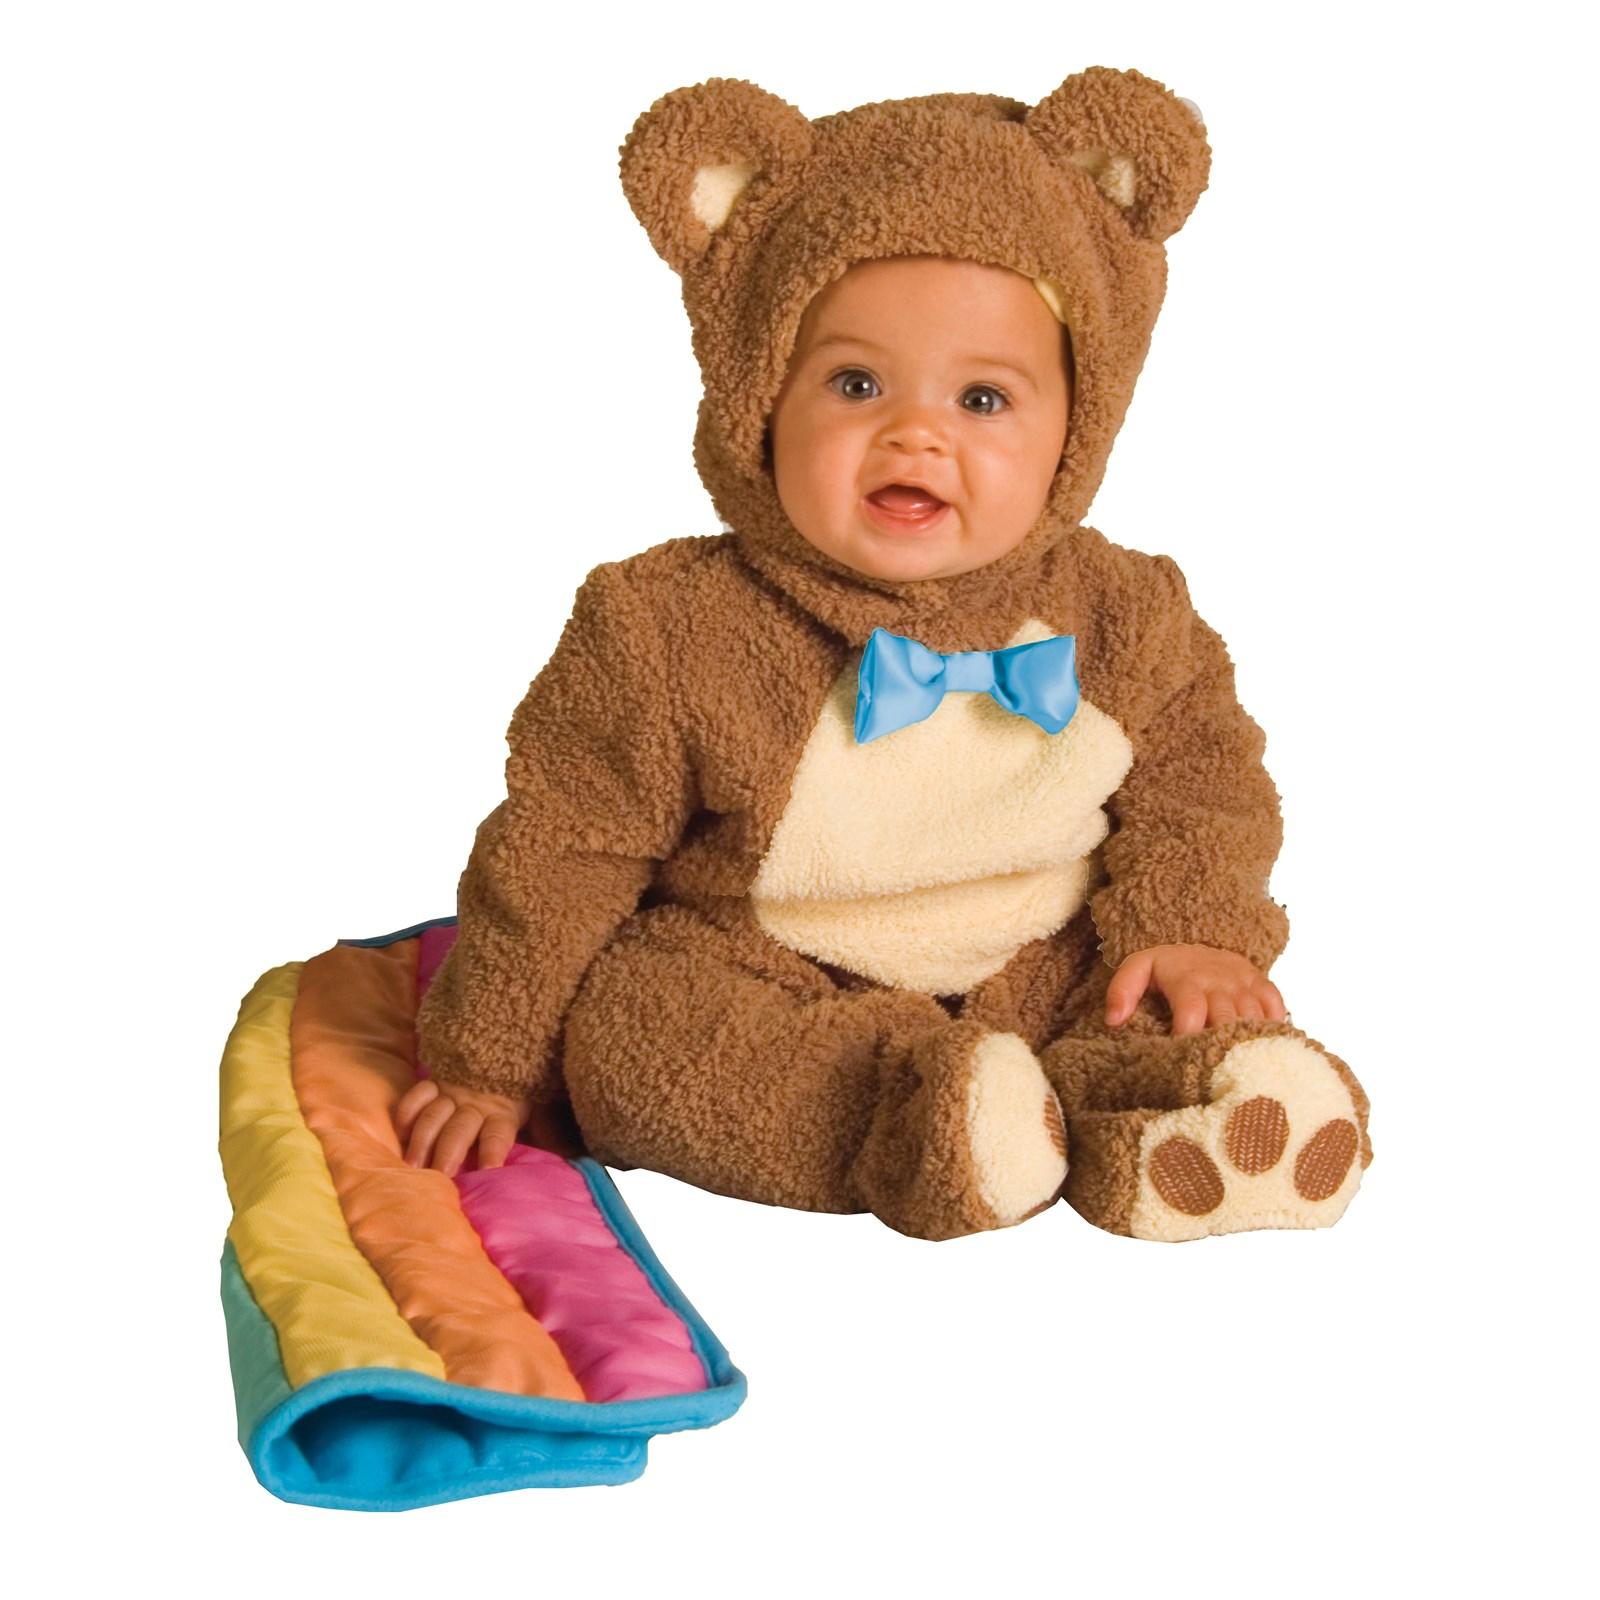 Baby Bear Costumes